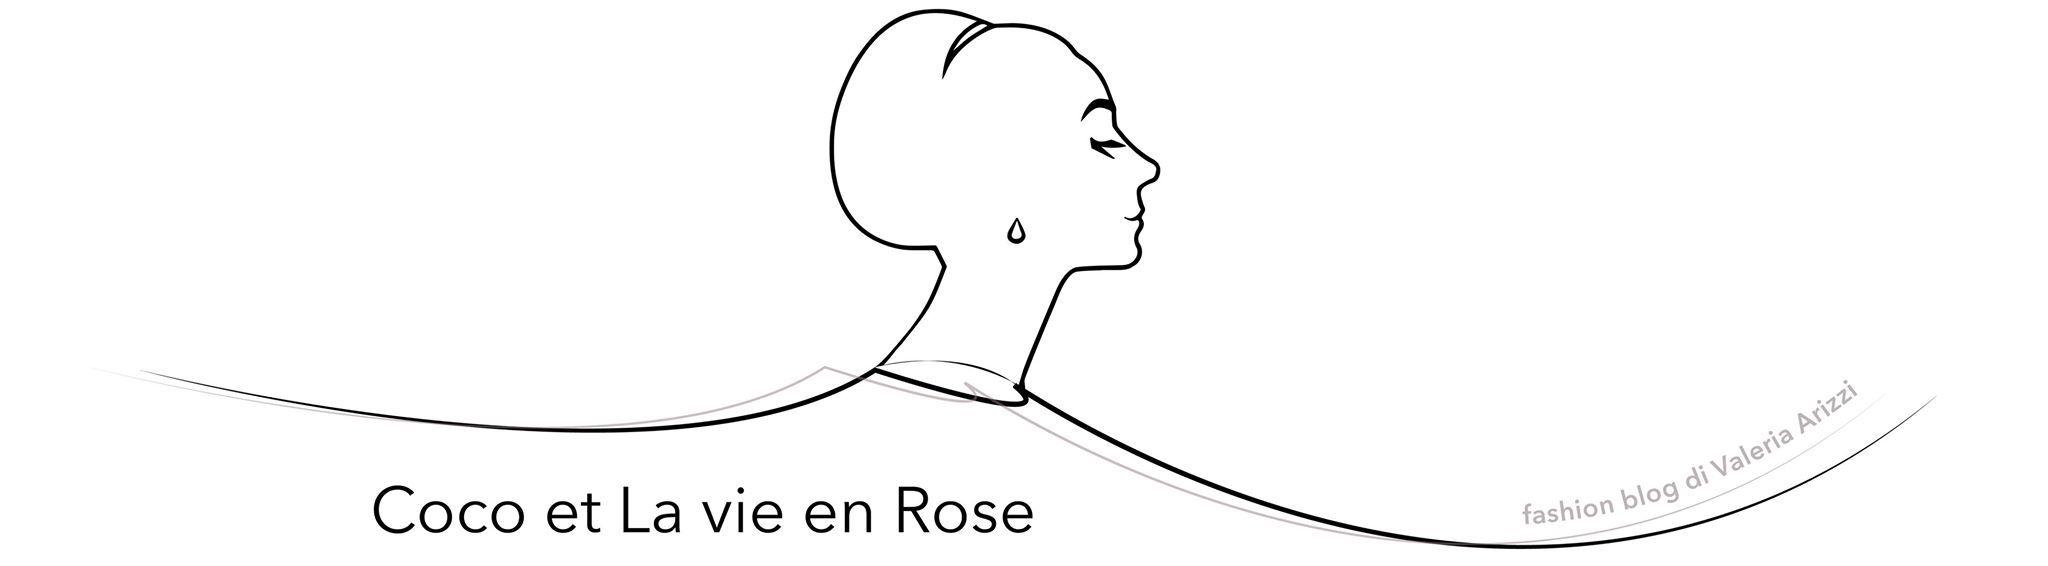 Coco et La vie en rose